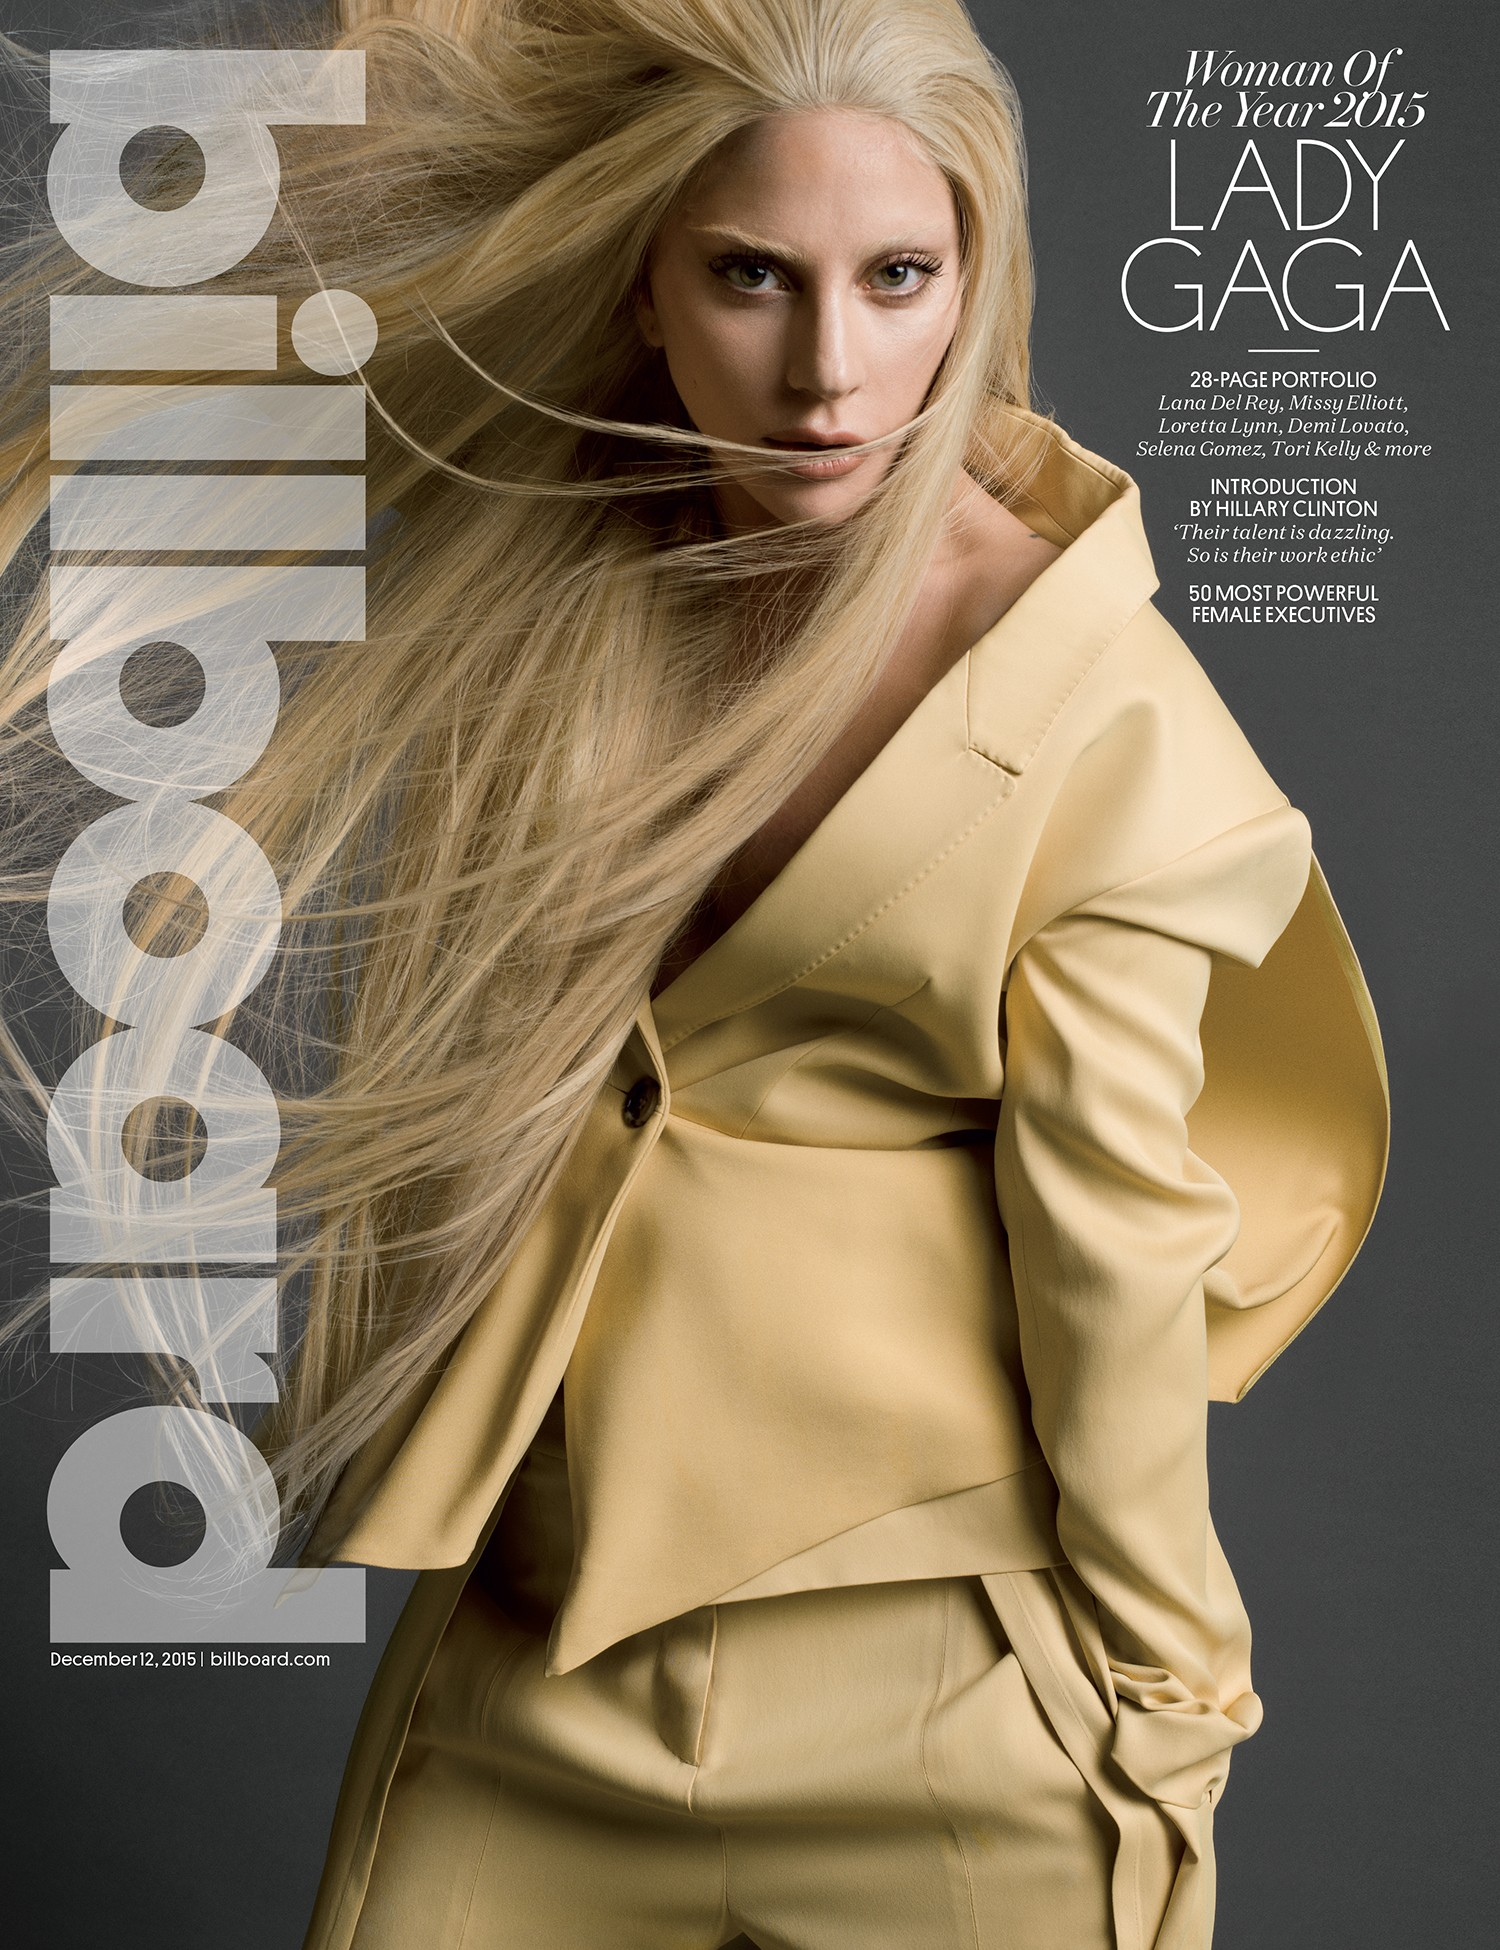 lady-gaga-women-in-music-2015-bb37-billb